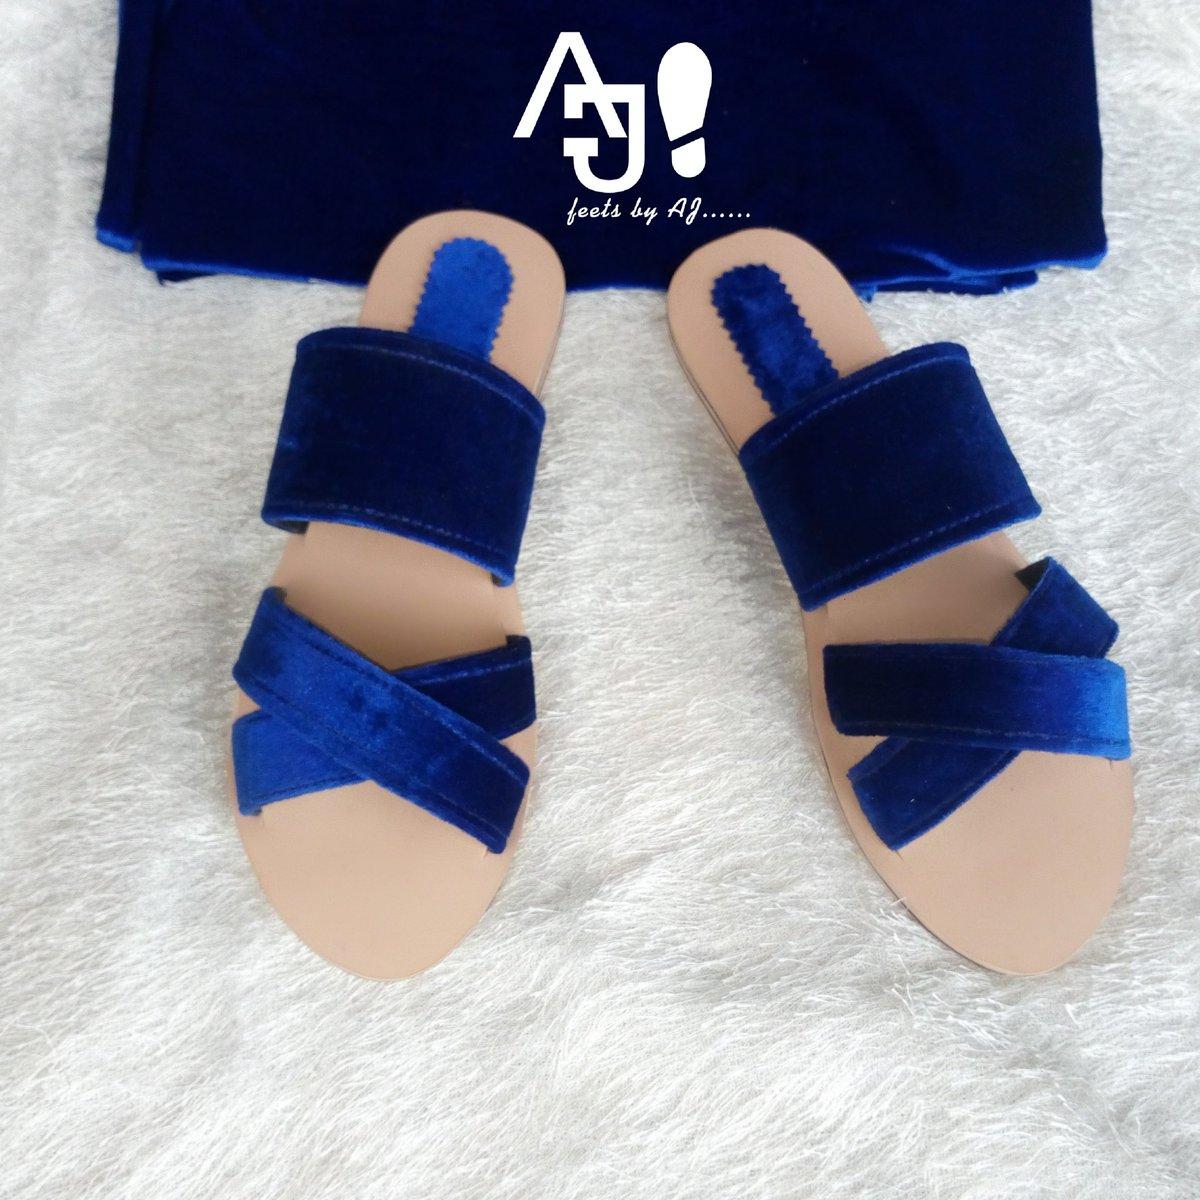 Ladies Blue velvet slippers can be made in any colour and size Dm for price #handmade #ladiesslippers #velvetpic.twitter.com/YUfqJBL9iG